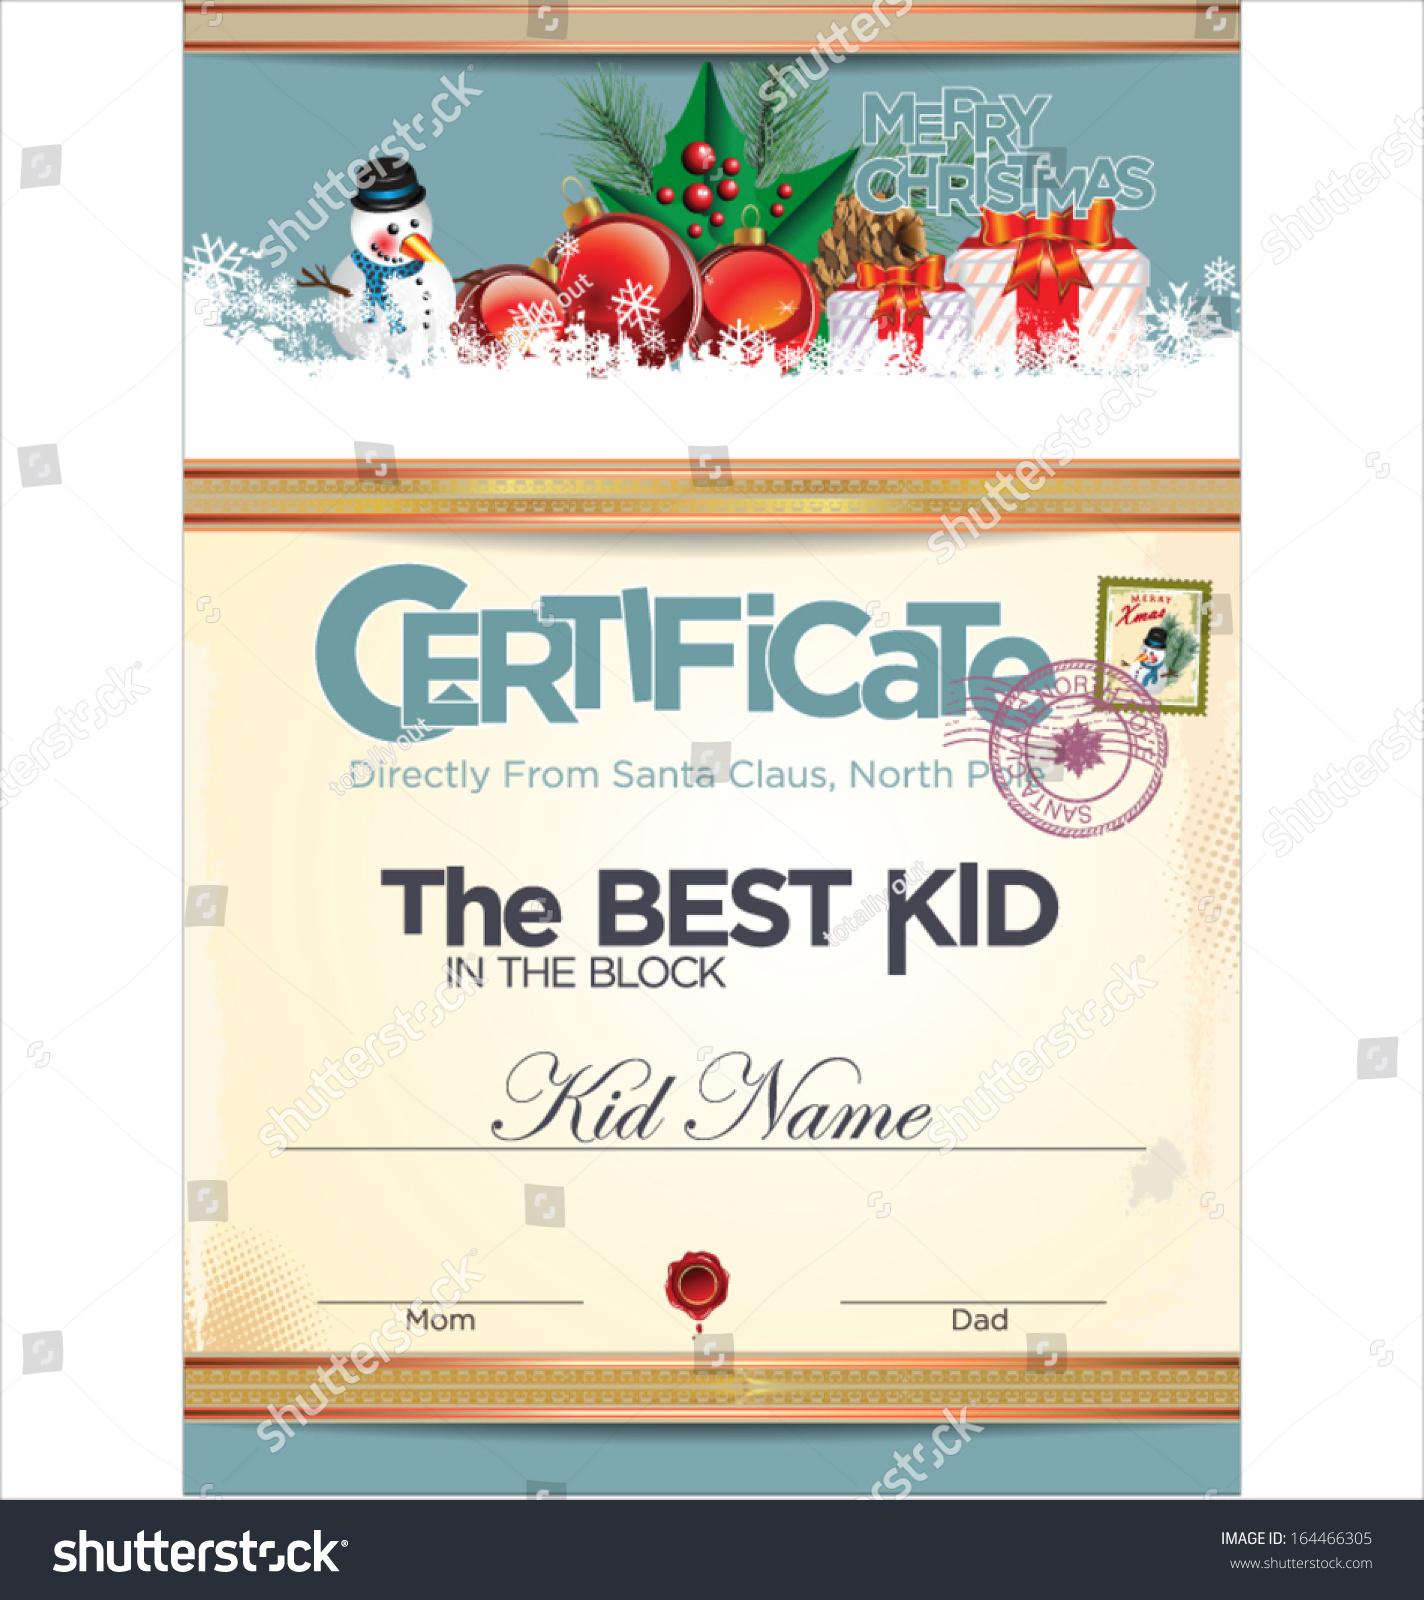 Best kid block certificate template stock vector 164466305 best kid in the block certificate template yadclub Images